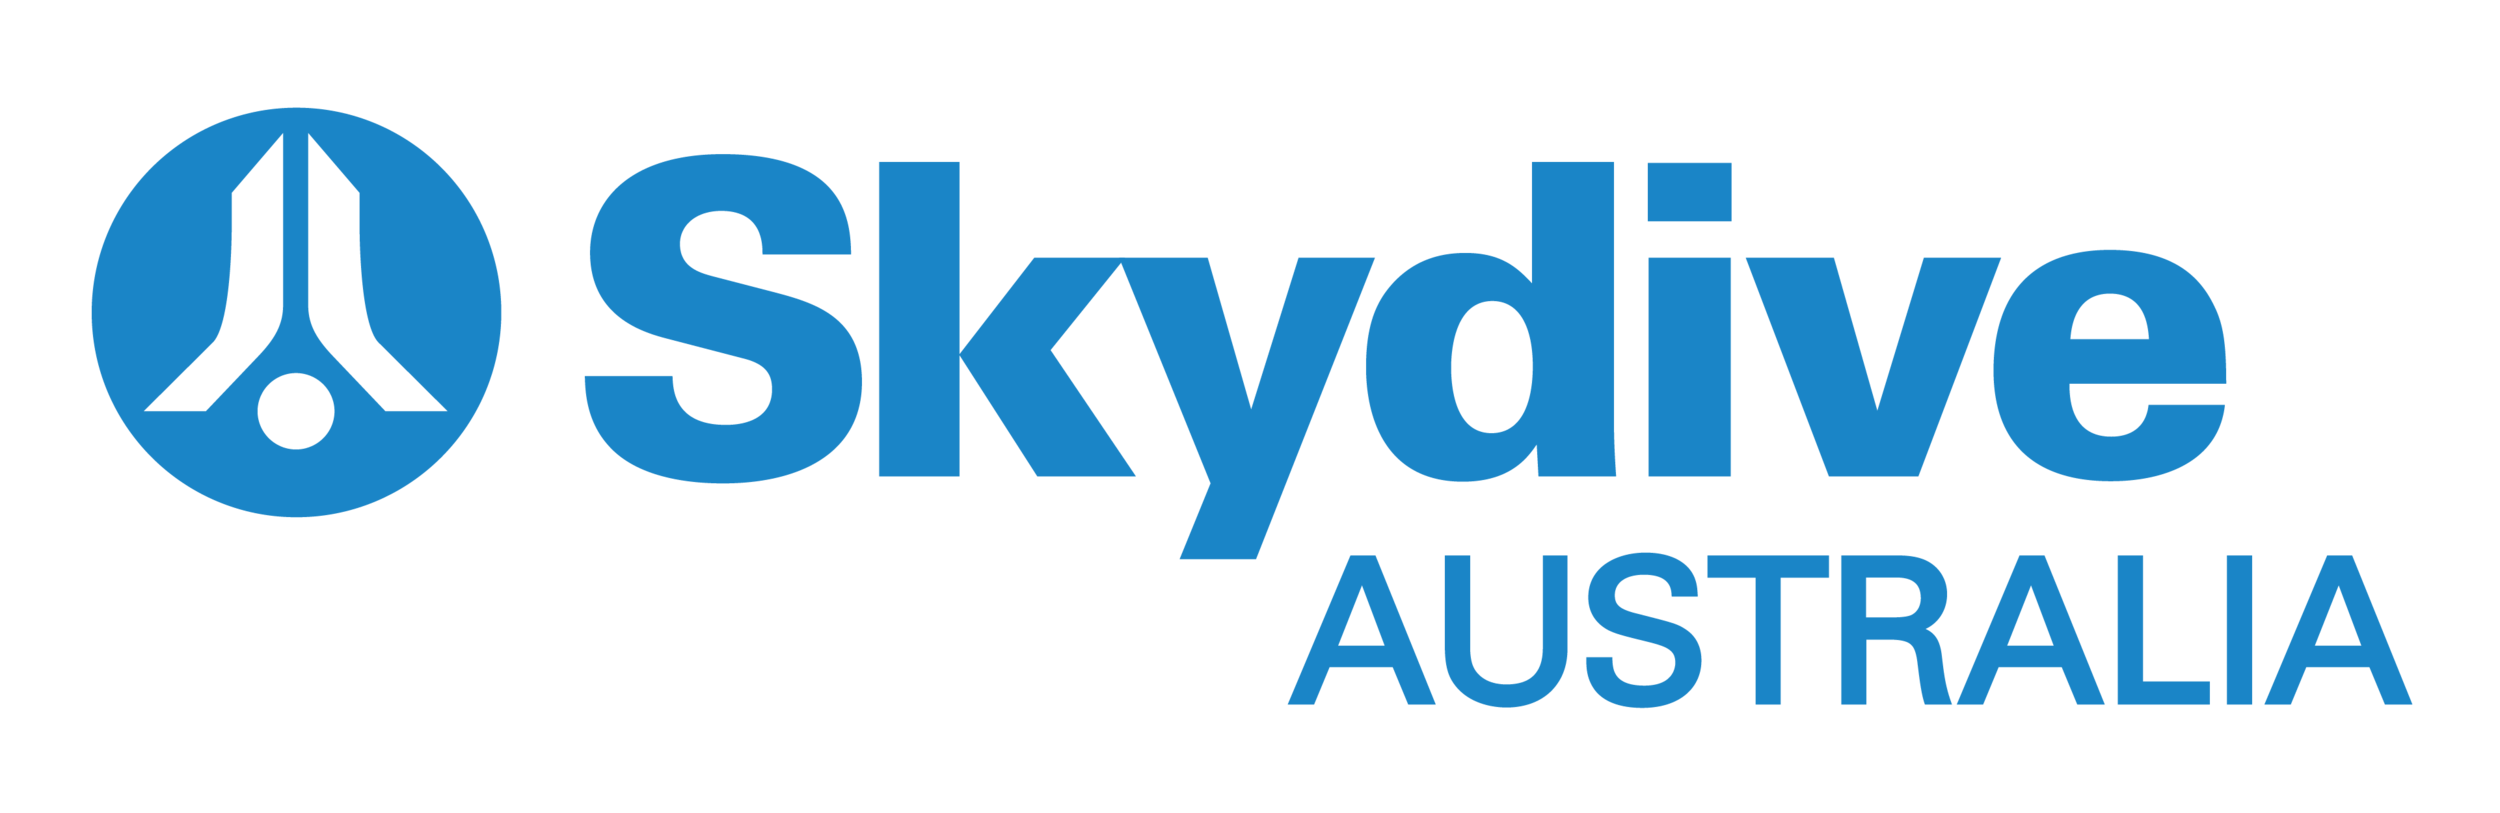 SKYDIVE AUSTRALIA - HORIZONTAL_Blue.png